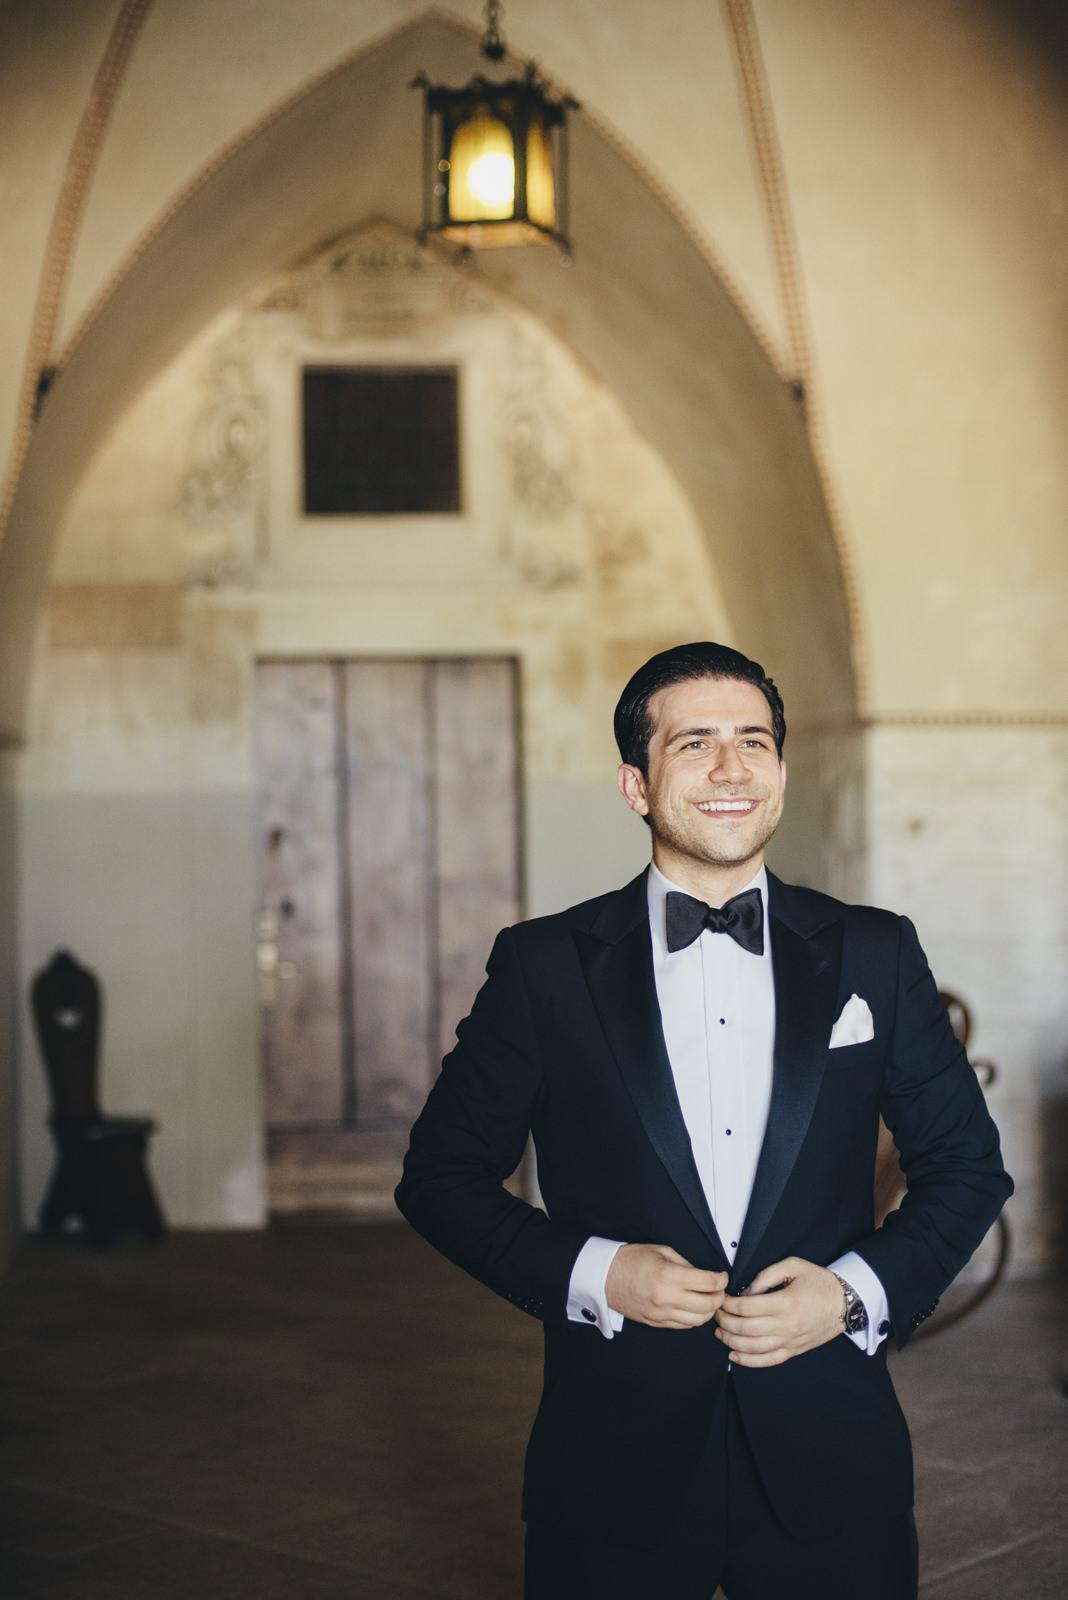 the groom wearing his jacket